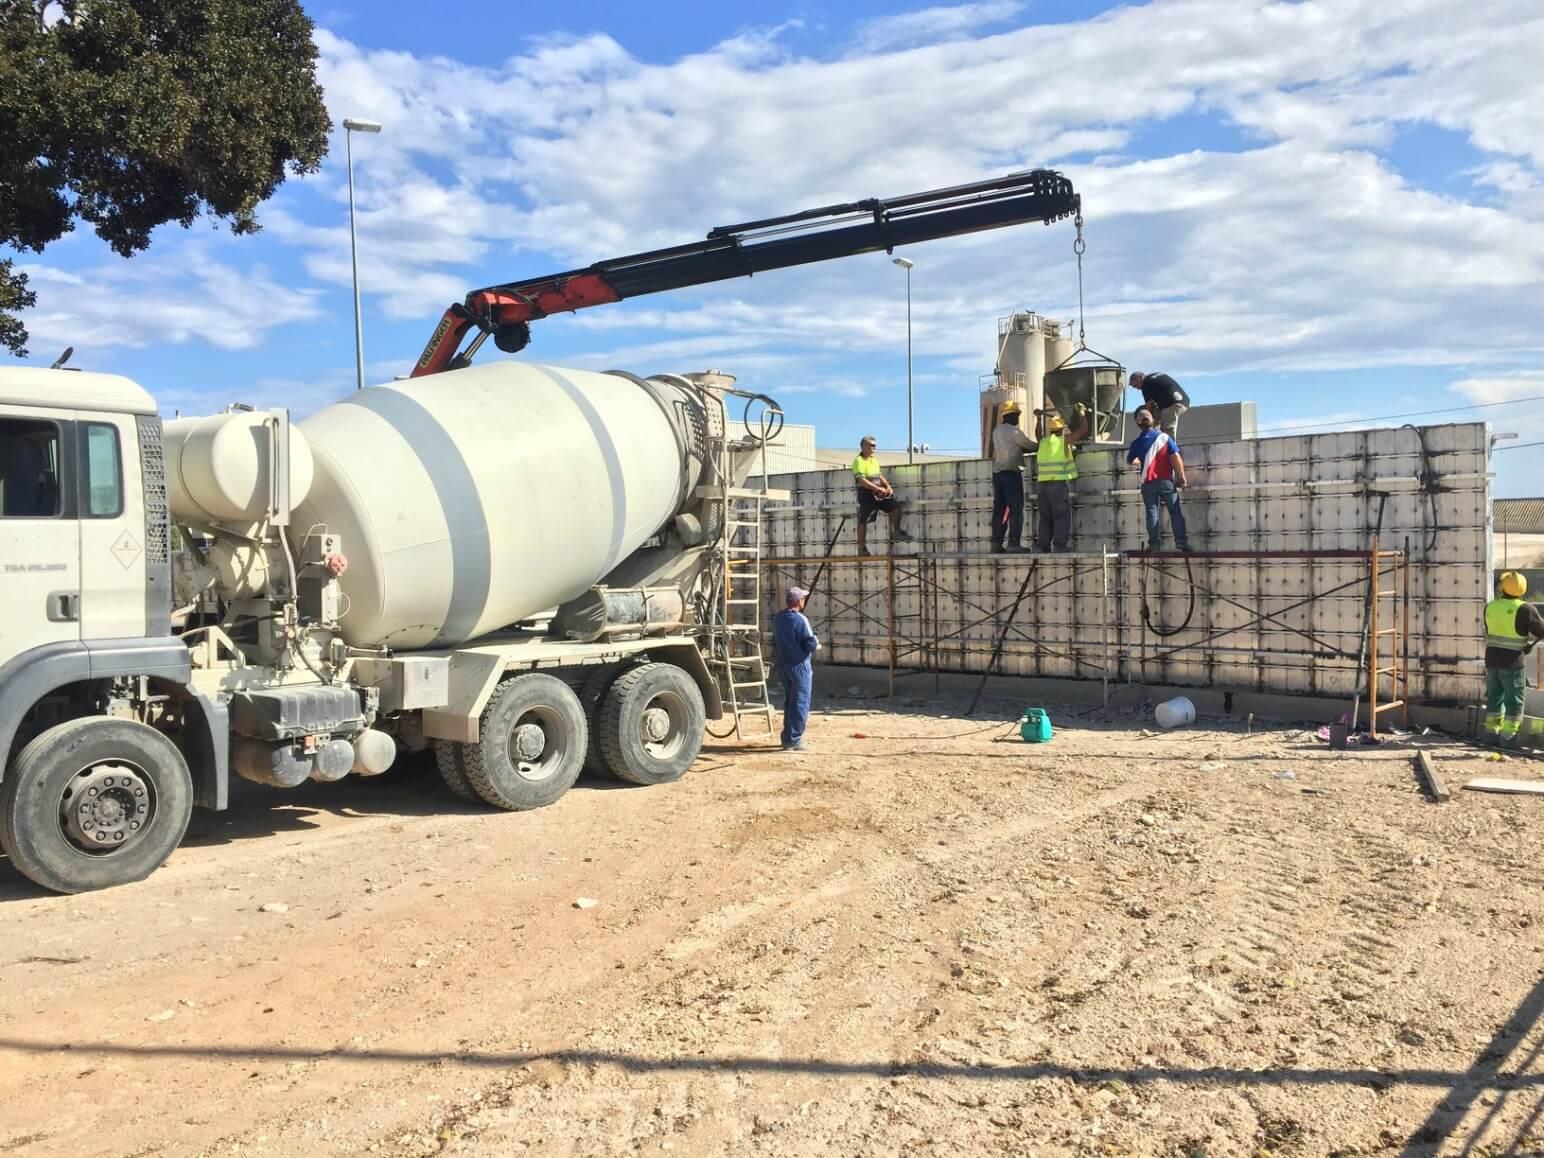 proyecto muro perimetral encofrados de aluminio construccion strong forms alicante 13